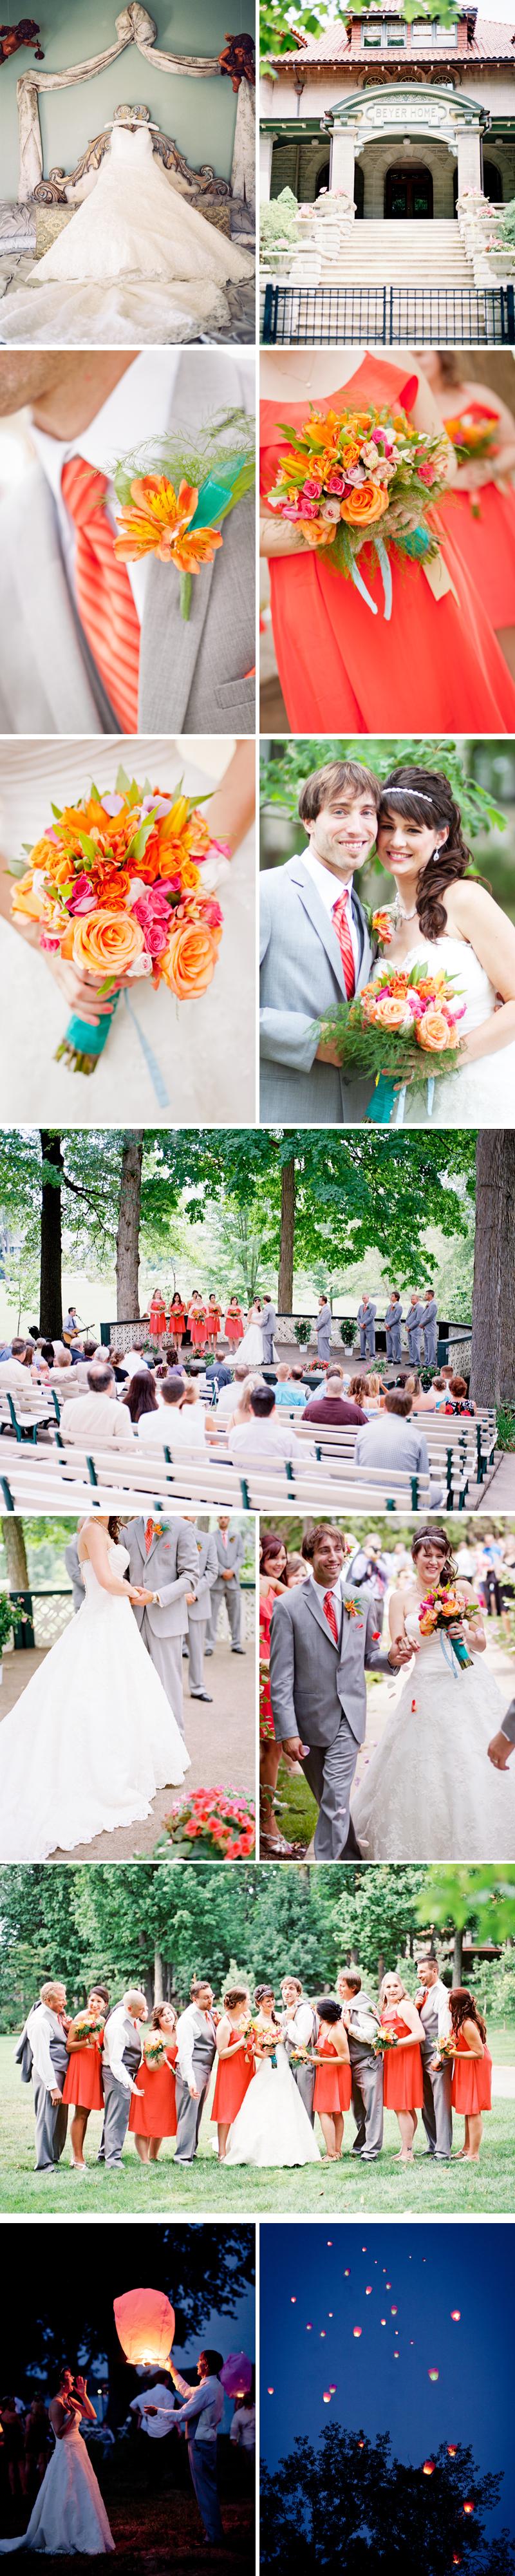 Winona Lake IN Outdoor Wedding, by Naomi & Sam Karth www.thekarths.com